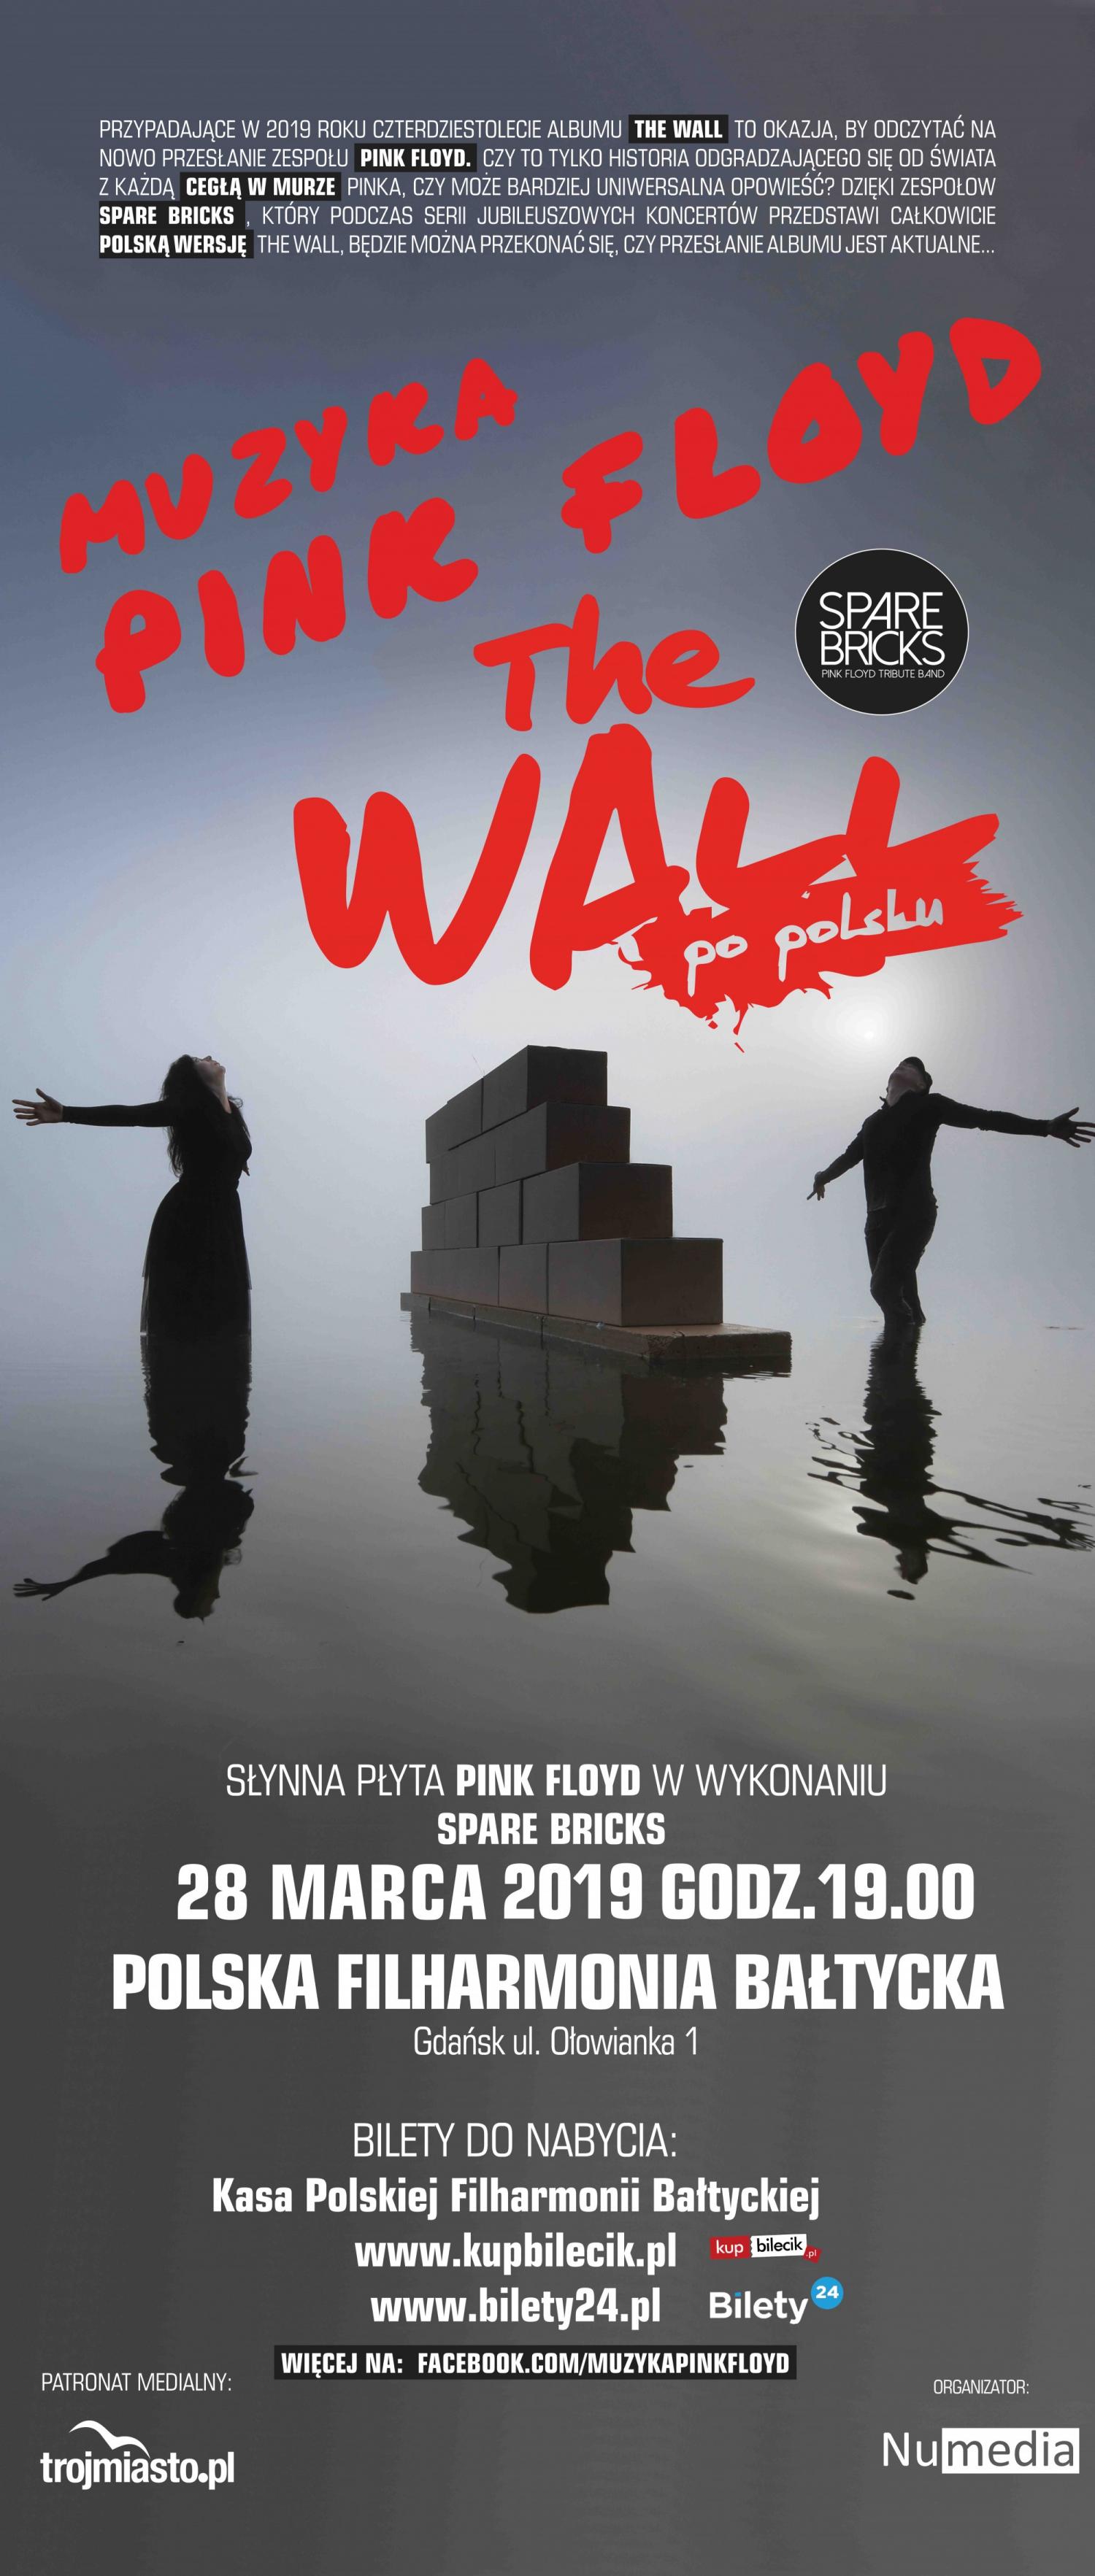 The Wall in Polish